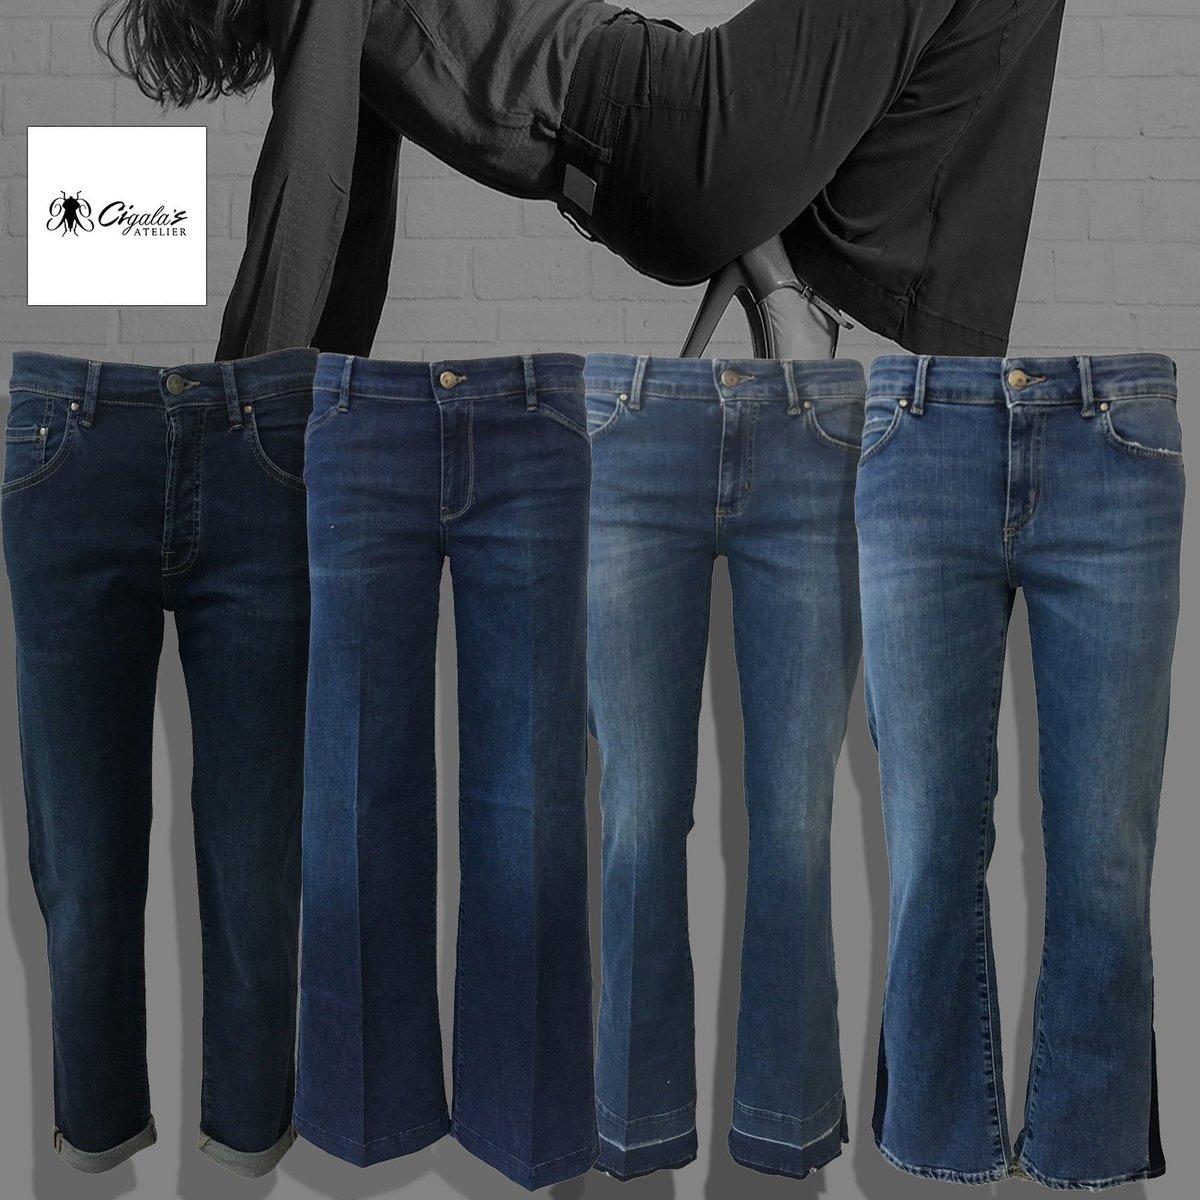 Scegli La tua #ombra #ateliercigalas#jeans #boyfriendjeans #denimstretch #palazzojeans #fourpockets #widejeans #croppedjeans #womanjeans #jeansfashion #jeansblogger #bloggerfashion #shoppingonline #infoinbio #alori1961 #morlupo #madeinitaly  http:// www.alori.it  - Ukustom